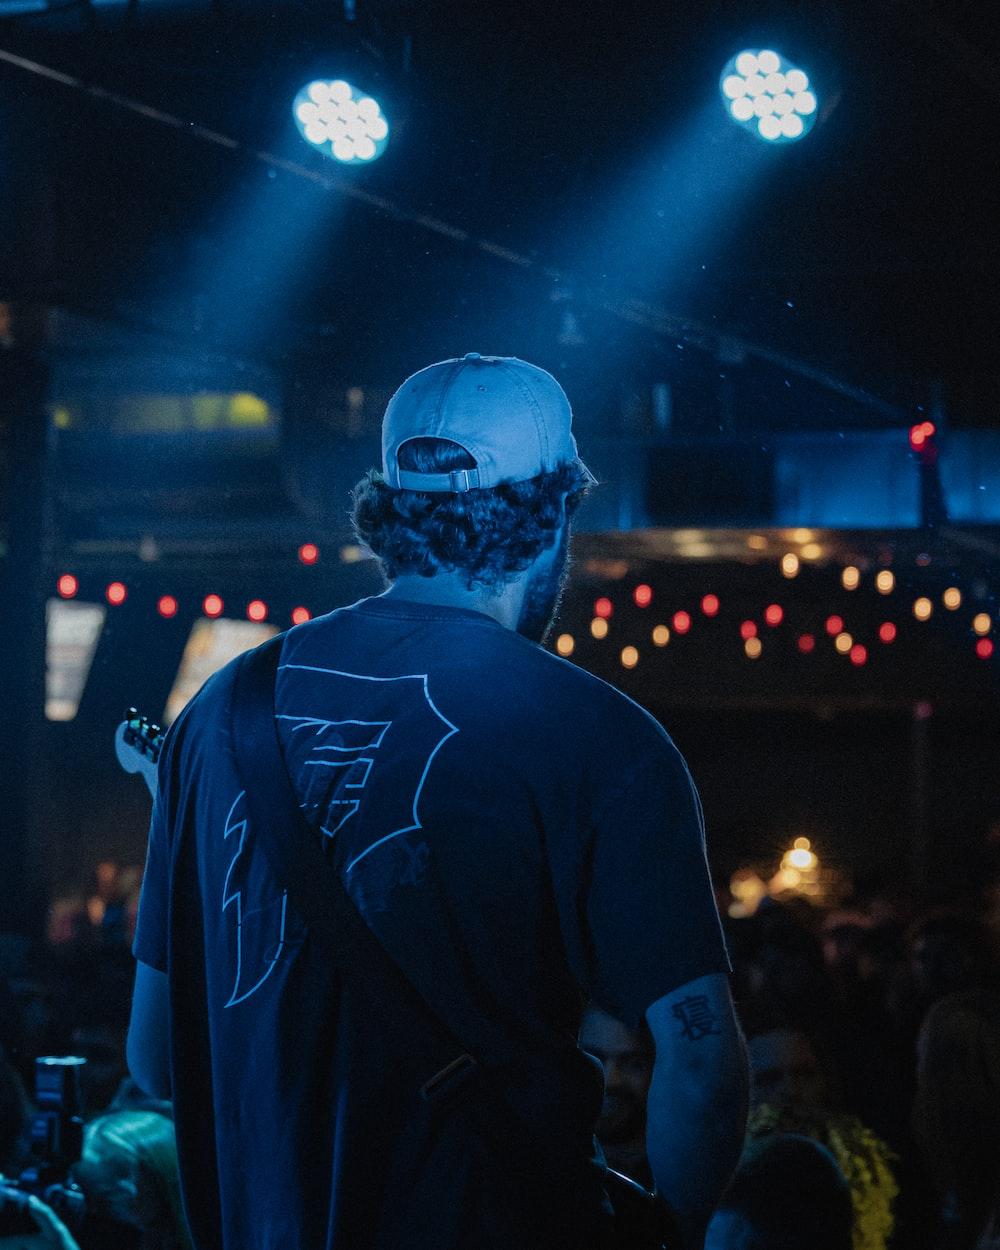 man in black crew neck t-shirt wearing blue helmet and blue helmet